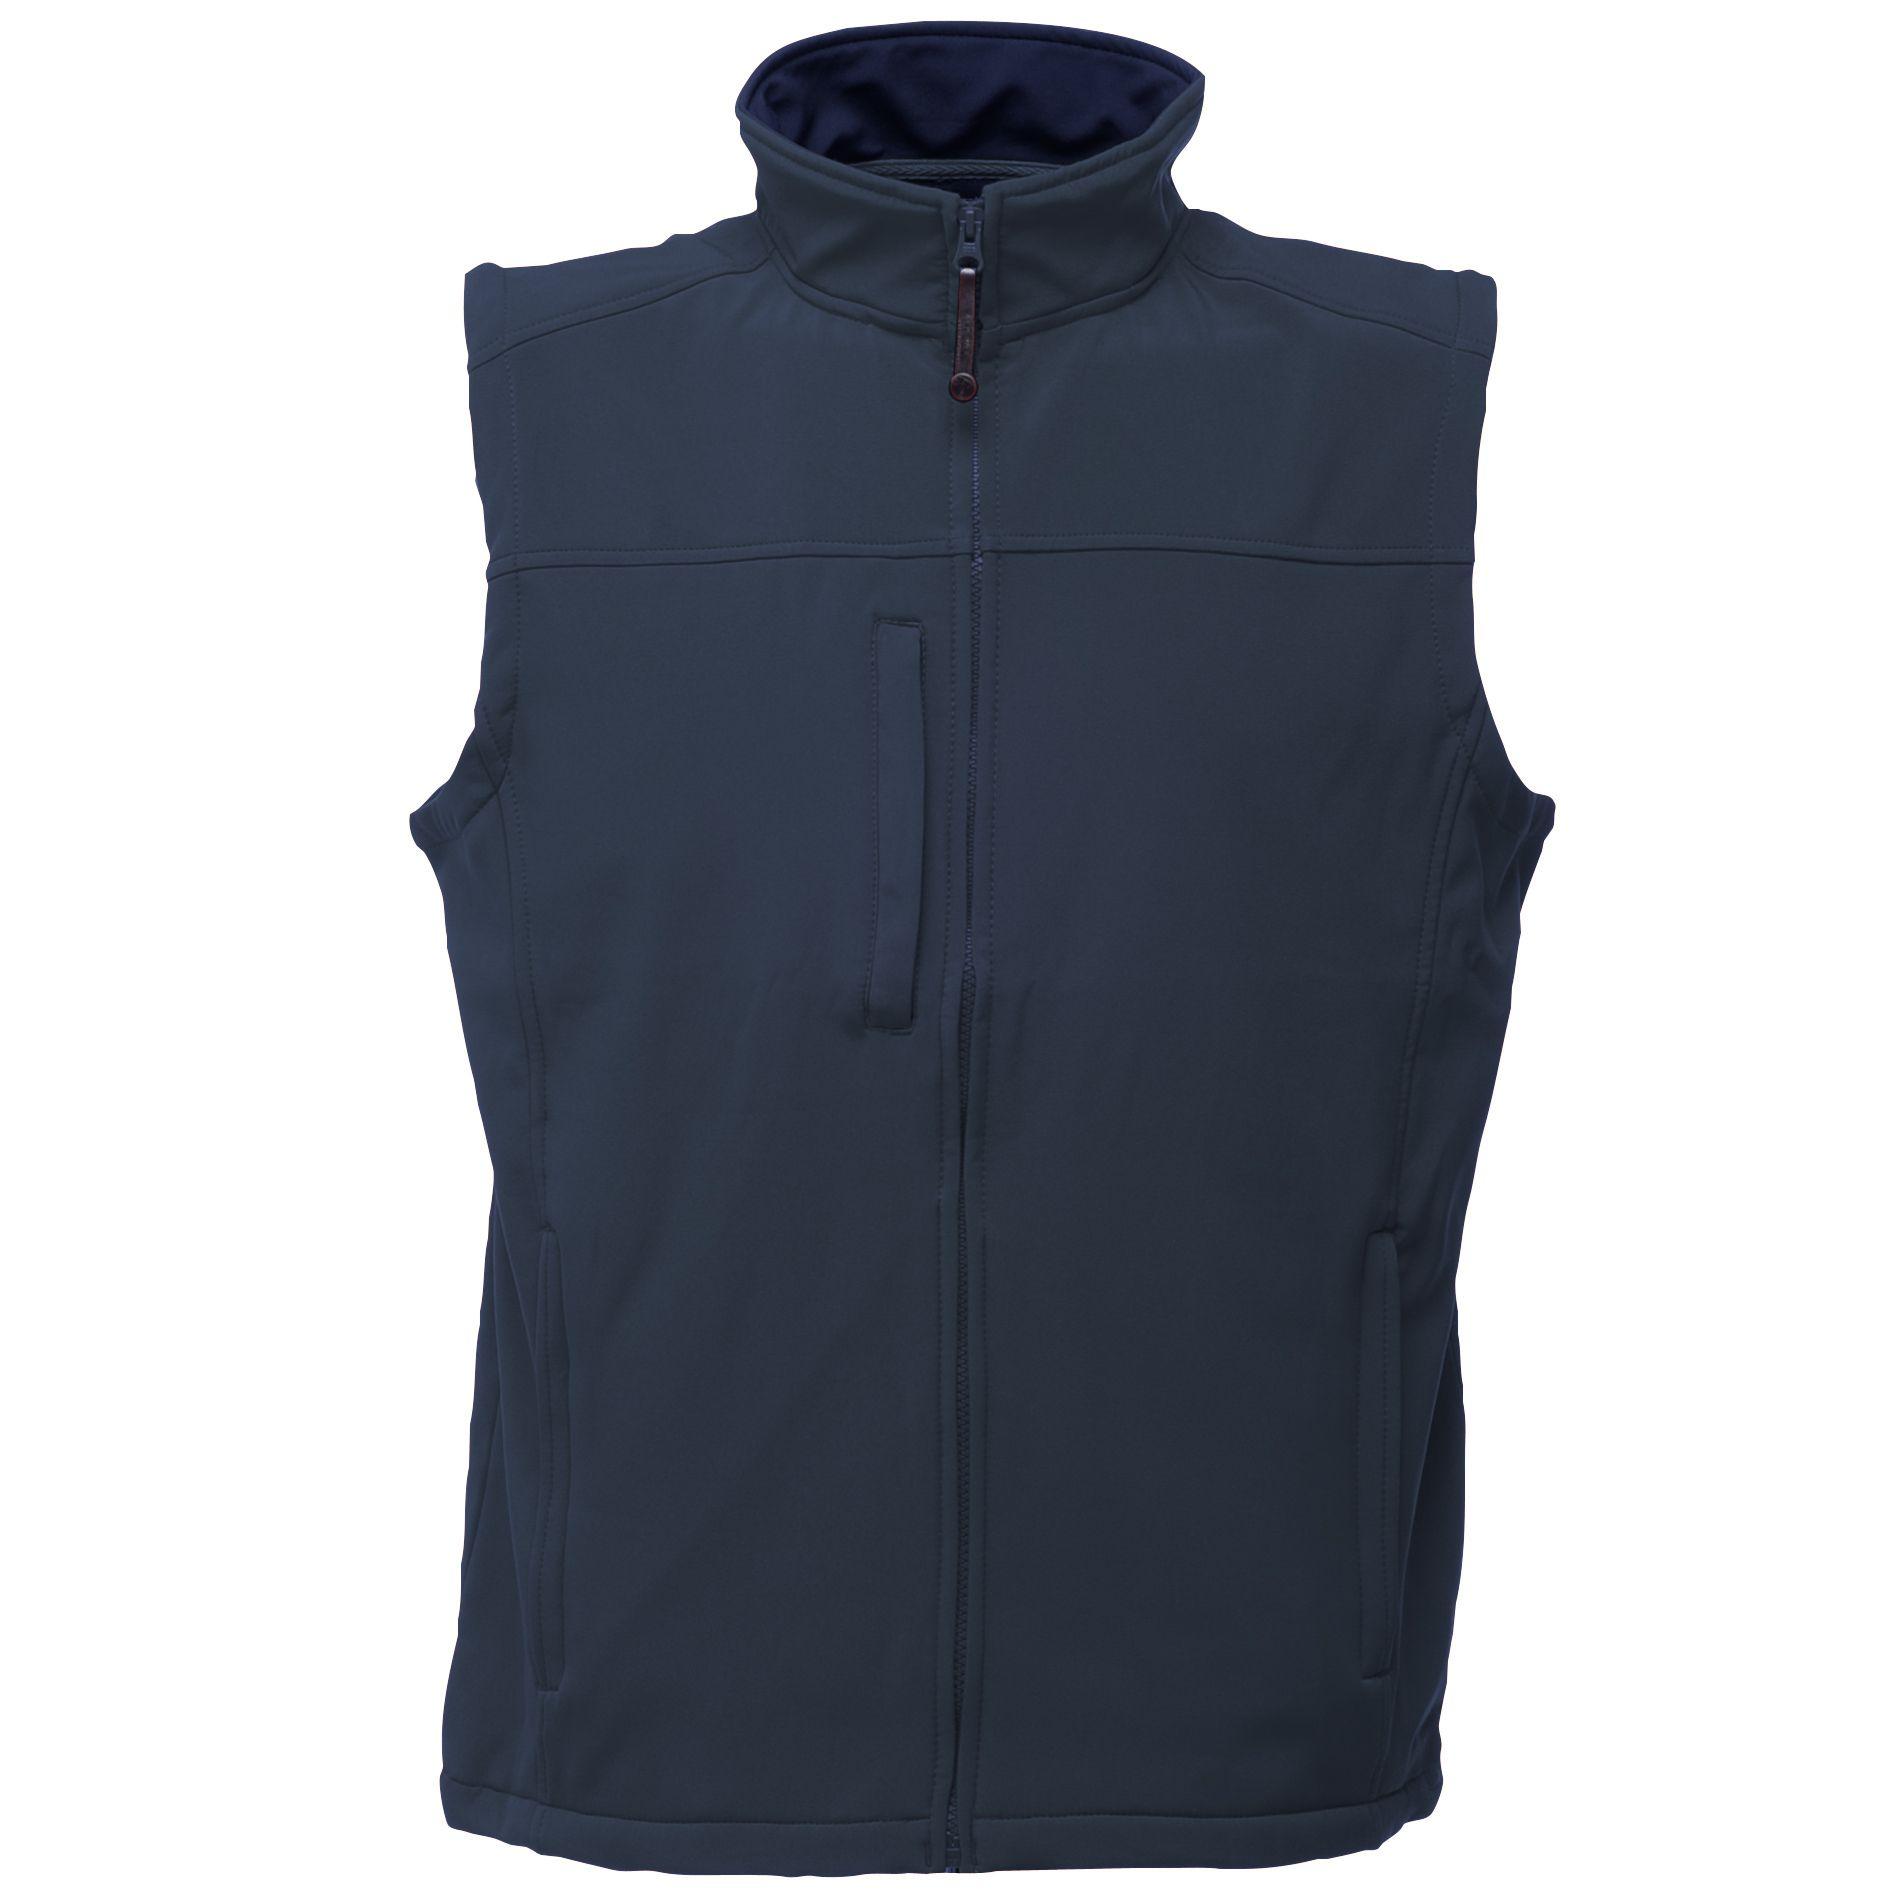 Regatta Mens Flux Softshell Bodywarmer / Sleeveless Jacket Water Repellent And Wind Resistant